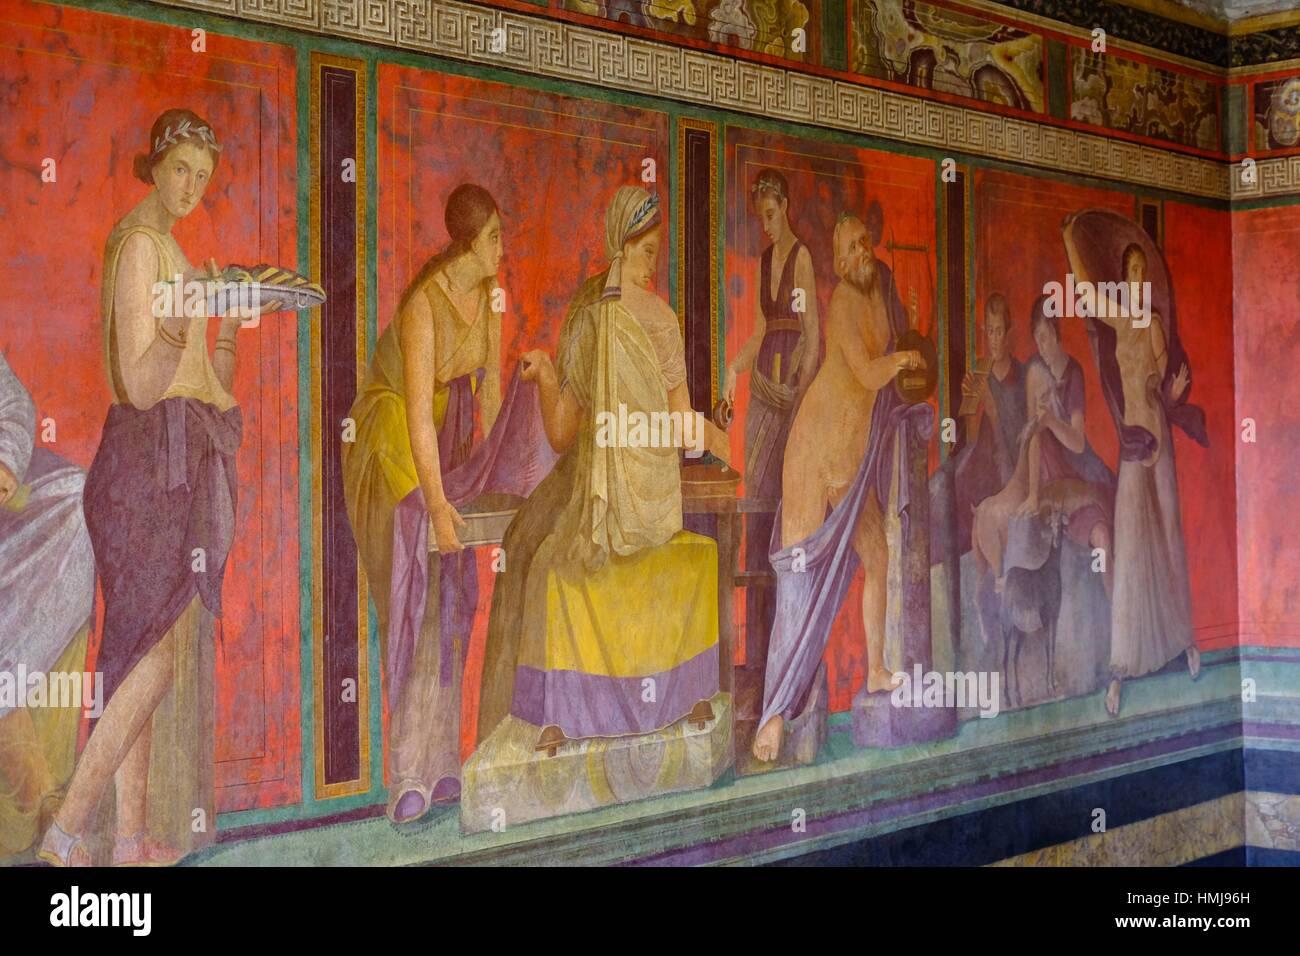 Roman frescoes at Villa of the Mysteries, Pompeii the ancient Roman town near Naples, Campania, Italy, Europe - Stock Image